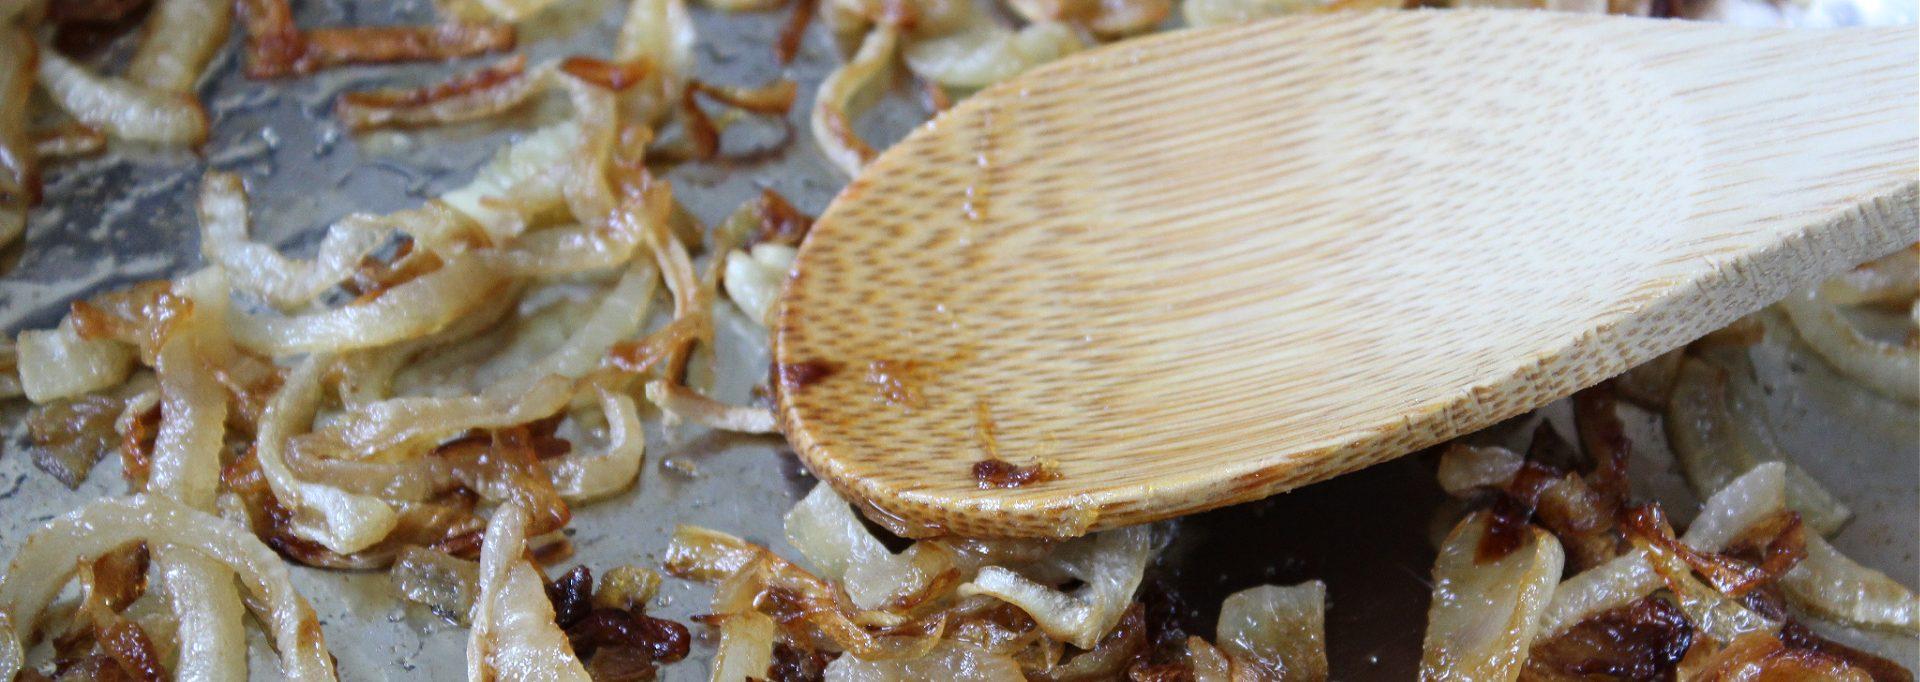 caramelize onions